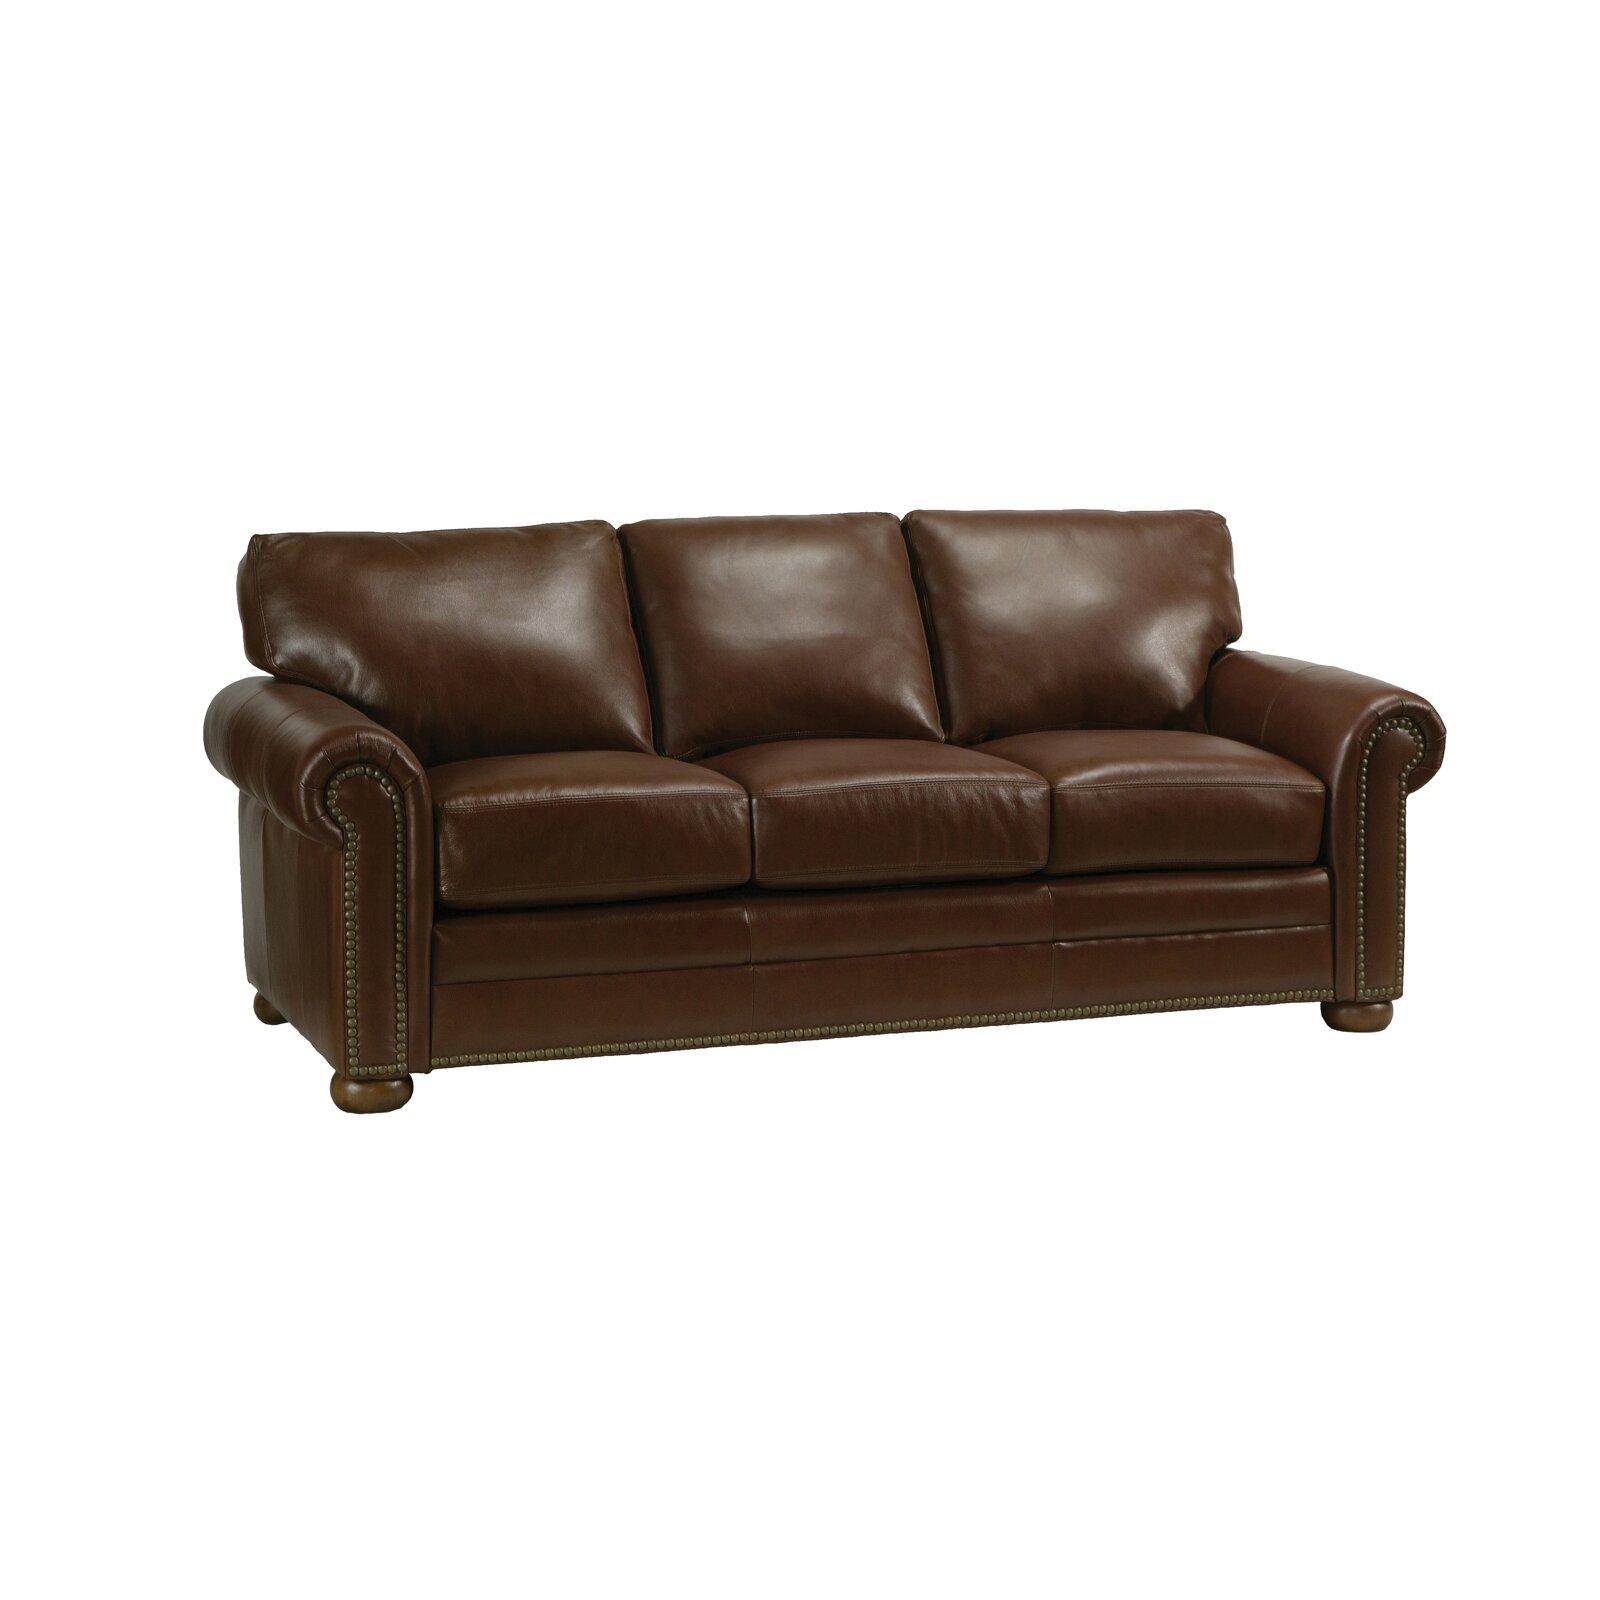 Wayfair Living Room Sets Omnia Leather Savannah Leather 3 Seat Sofa Living Room Set